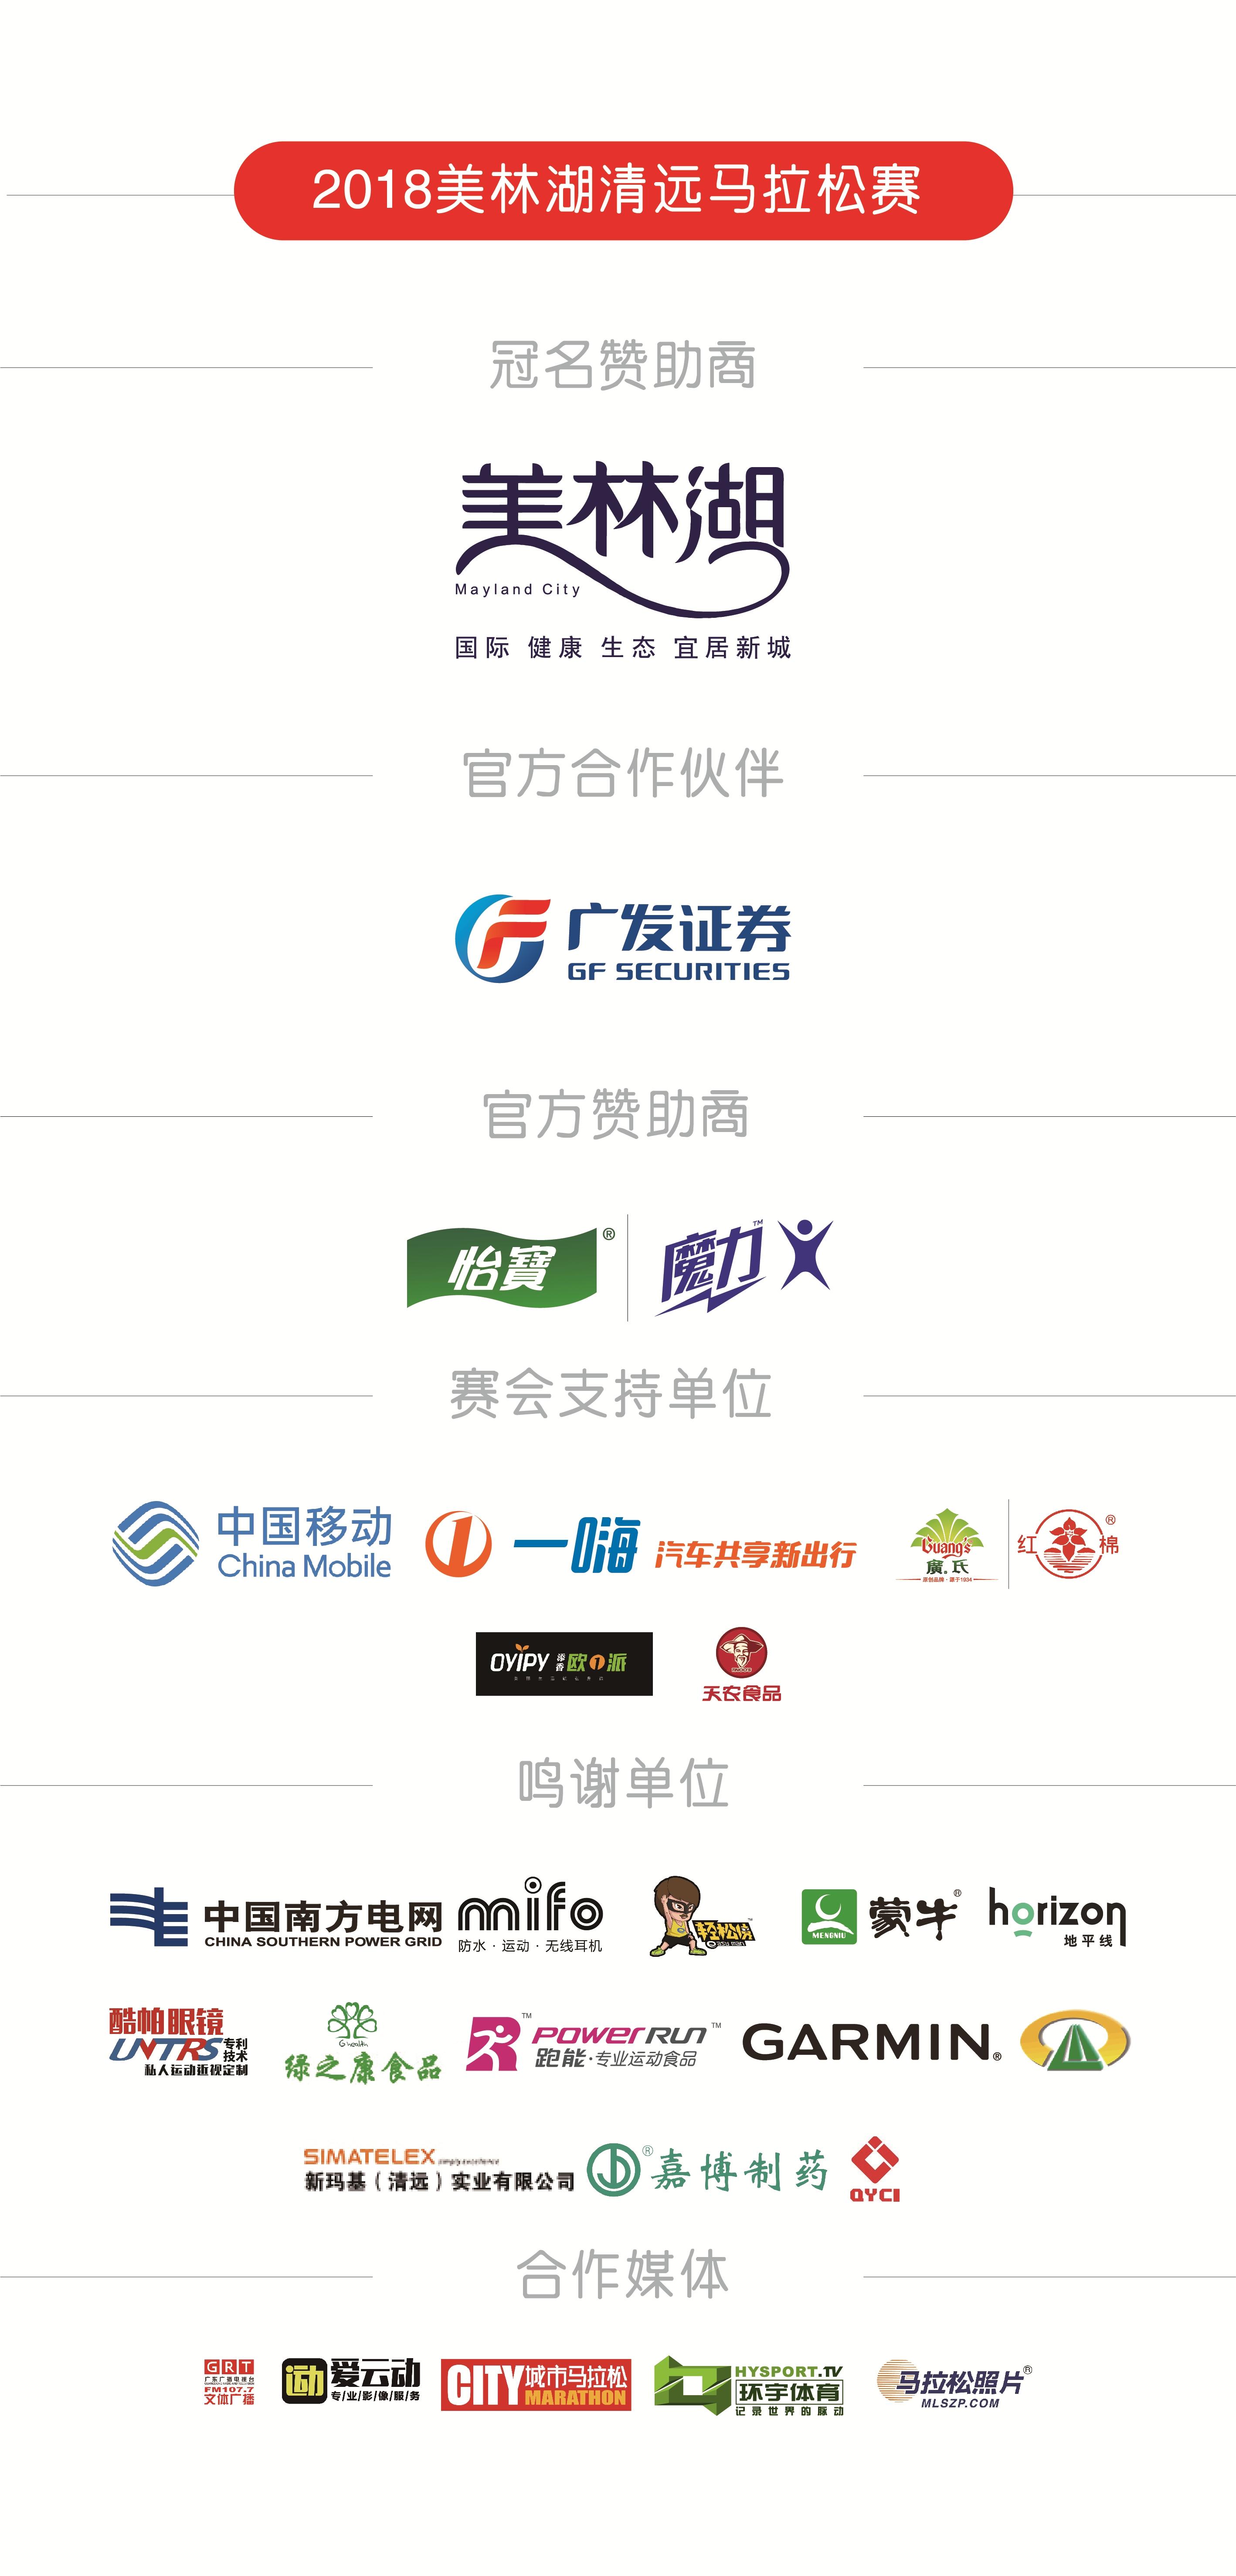 http://img.sport-china.cn/180308175aa104d37da72.jpeg